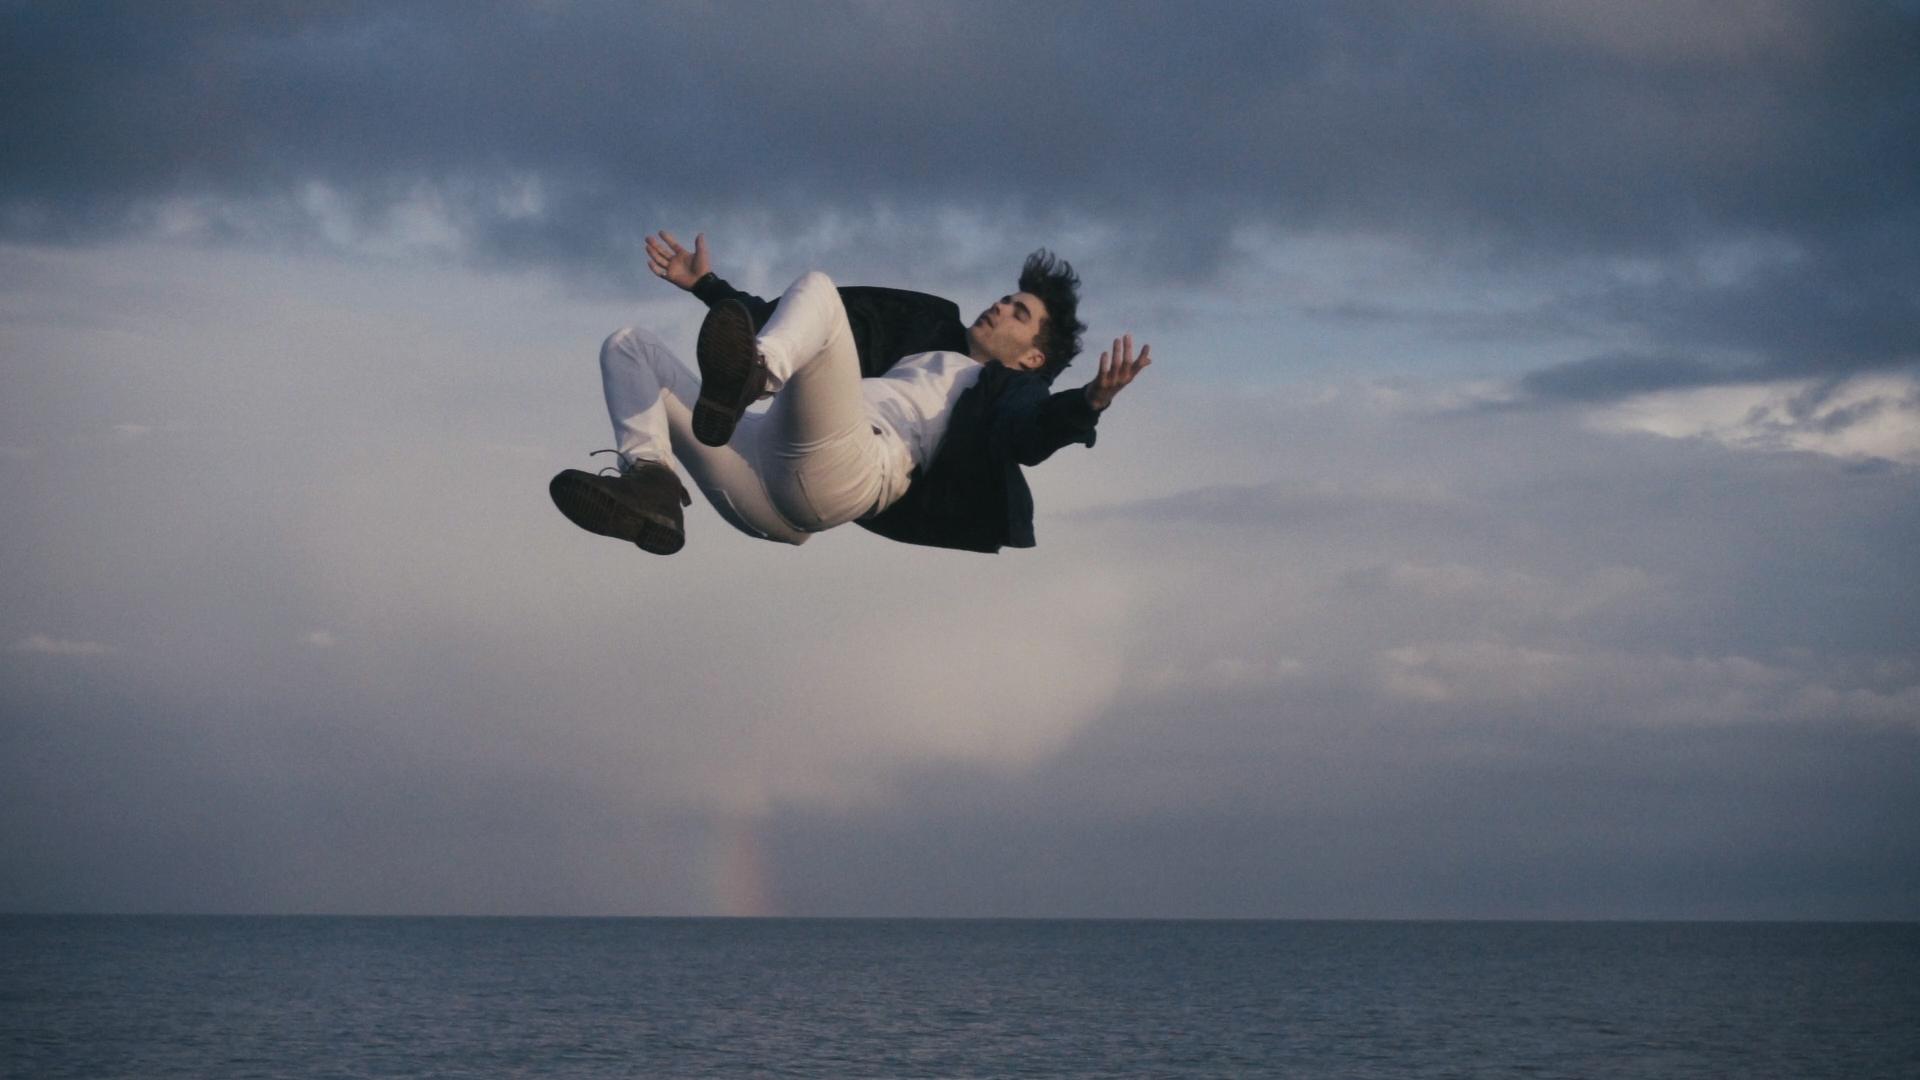 Will-Falling.jpg